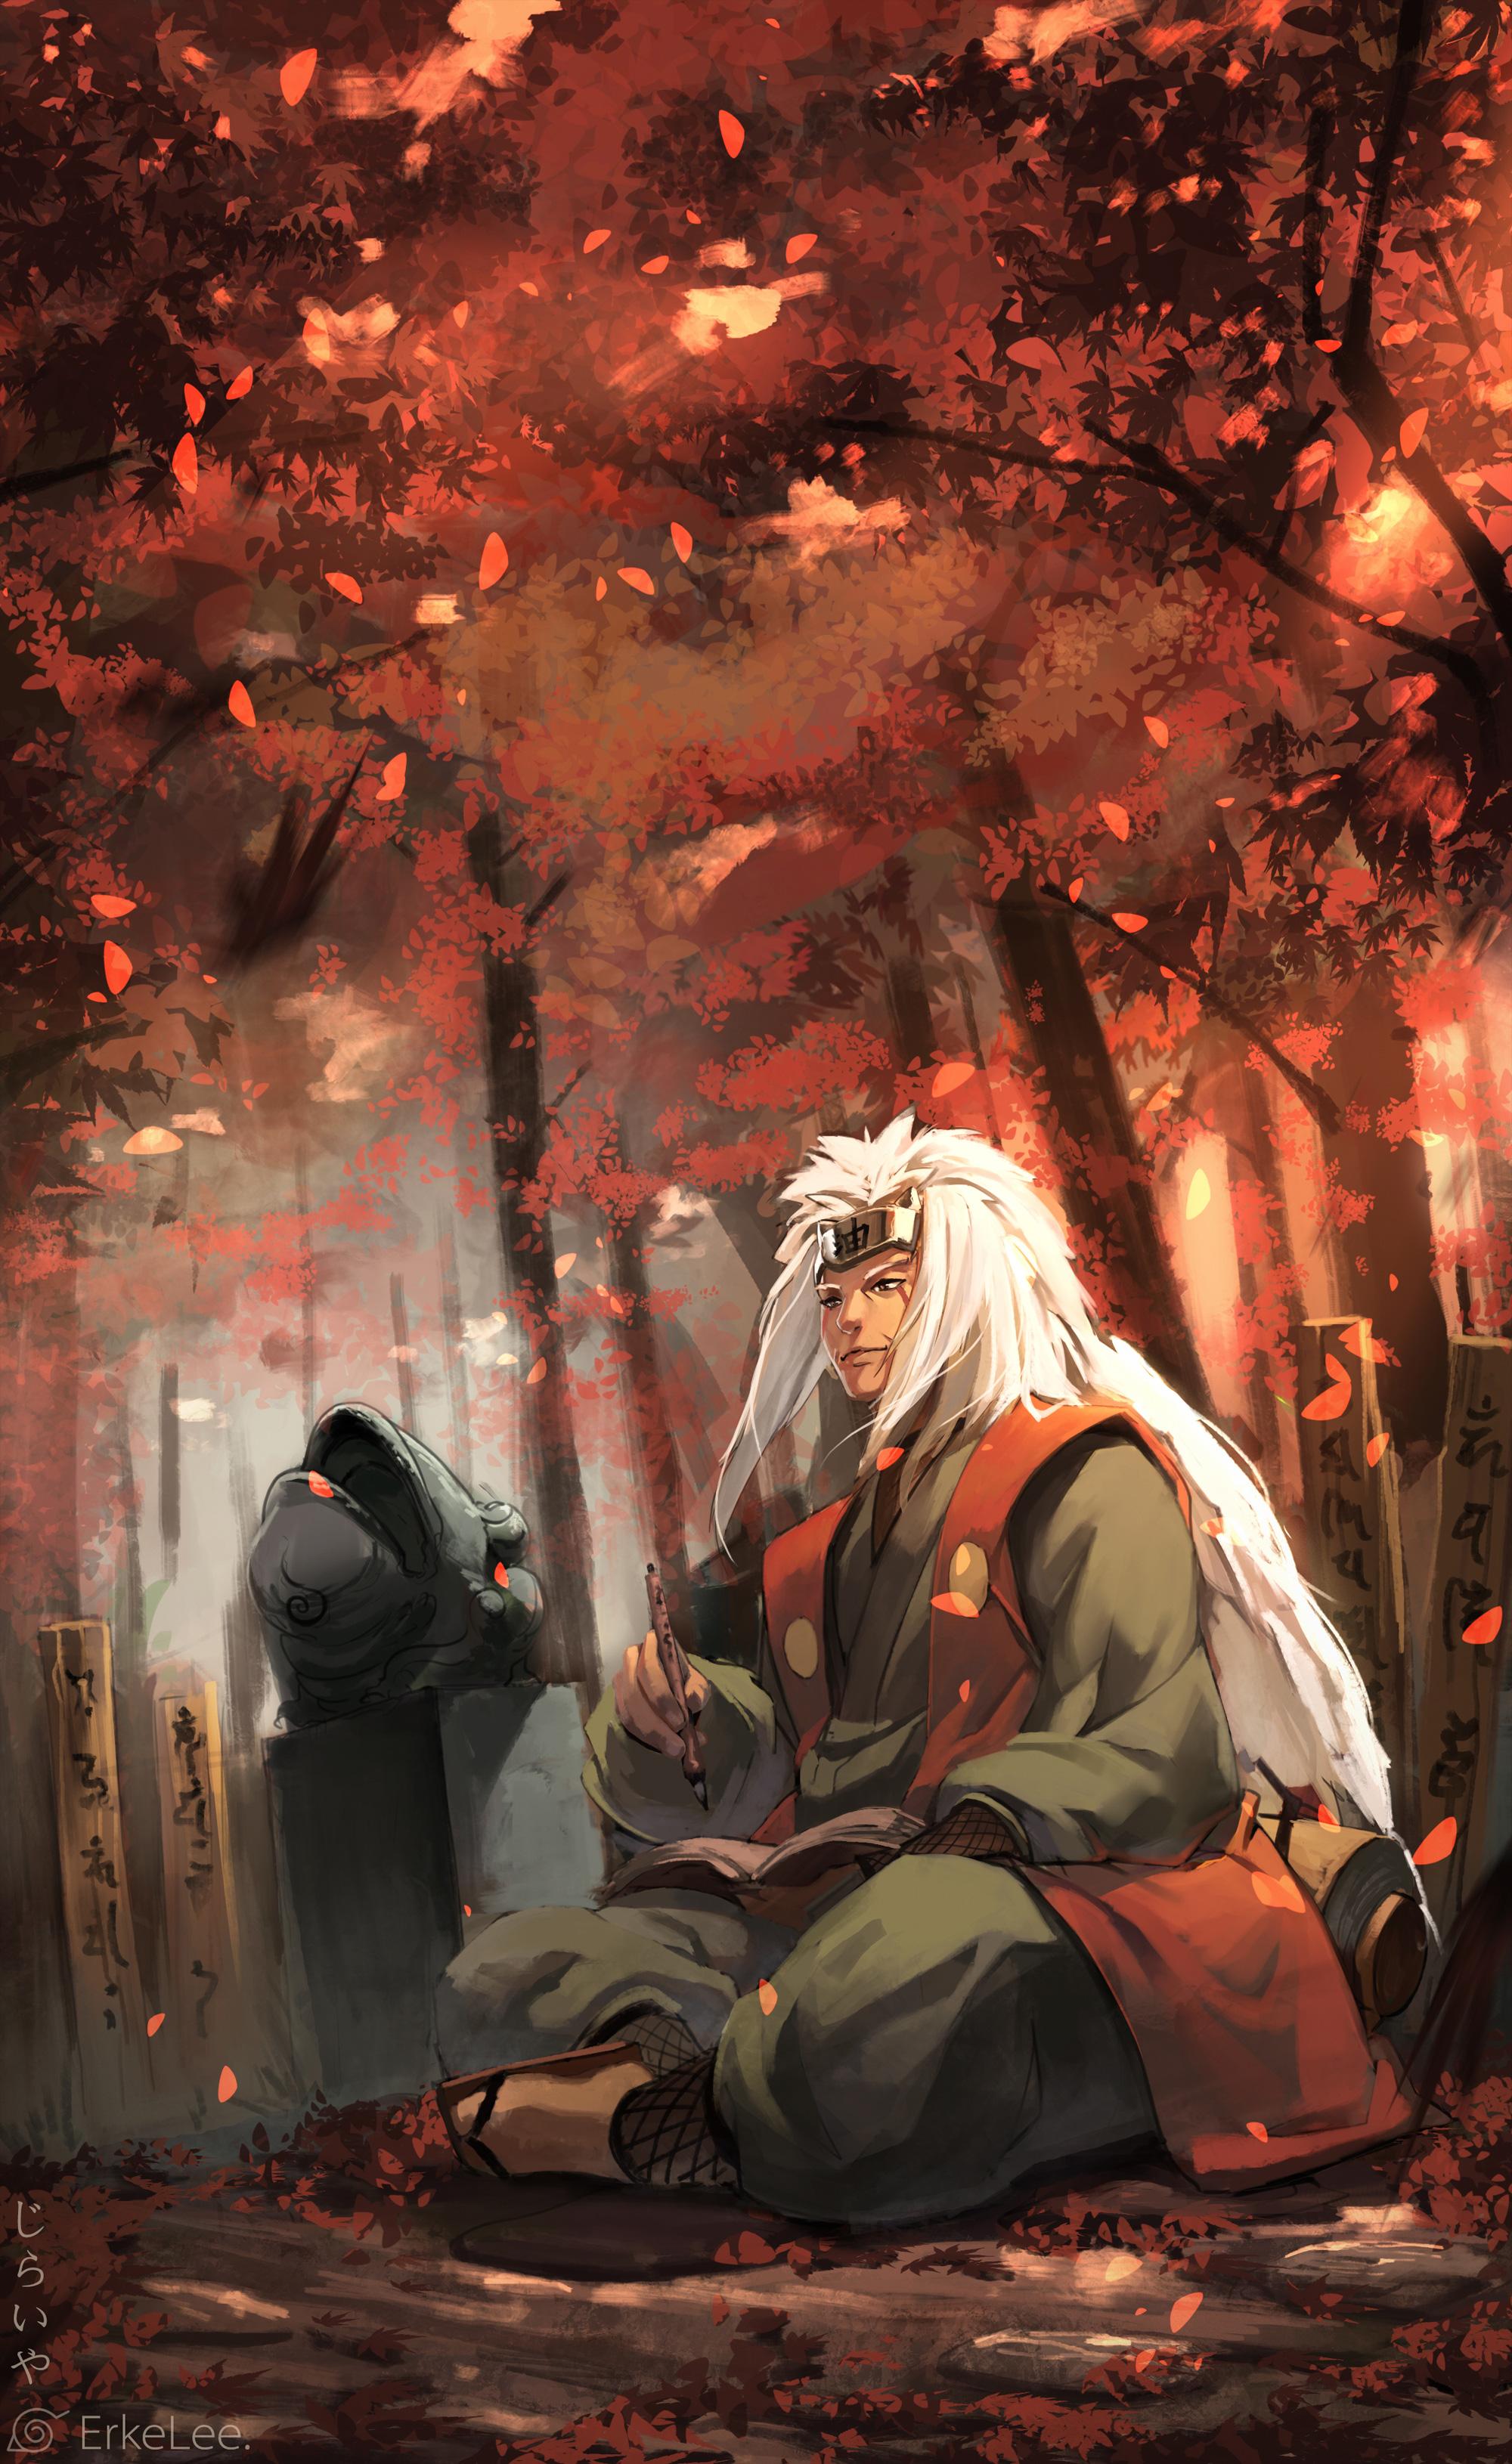 Top-Ten-Pixiv-Artworks-of-the-Week-#2-Naruto-Edition_Haruhichan.com_#3_NARUTO-FINAL-COUNTDOWN_ErkeLee